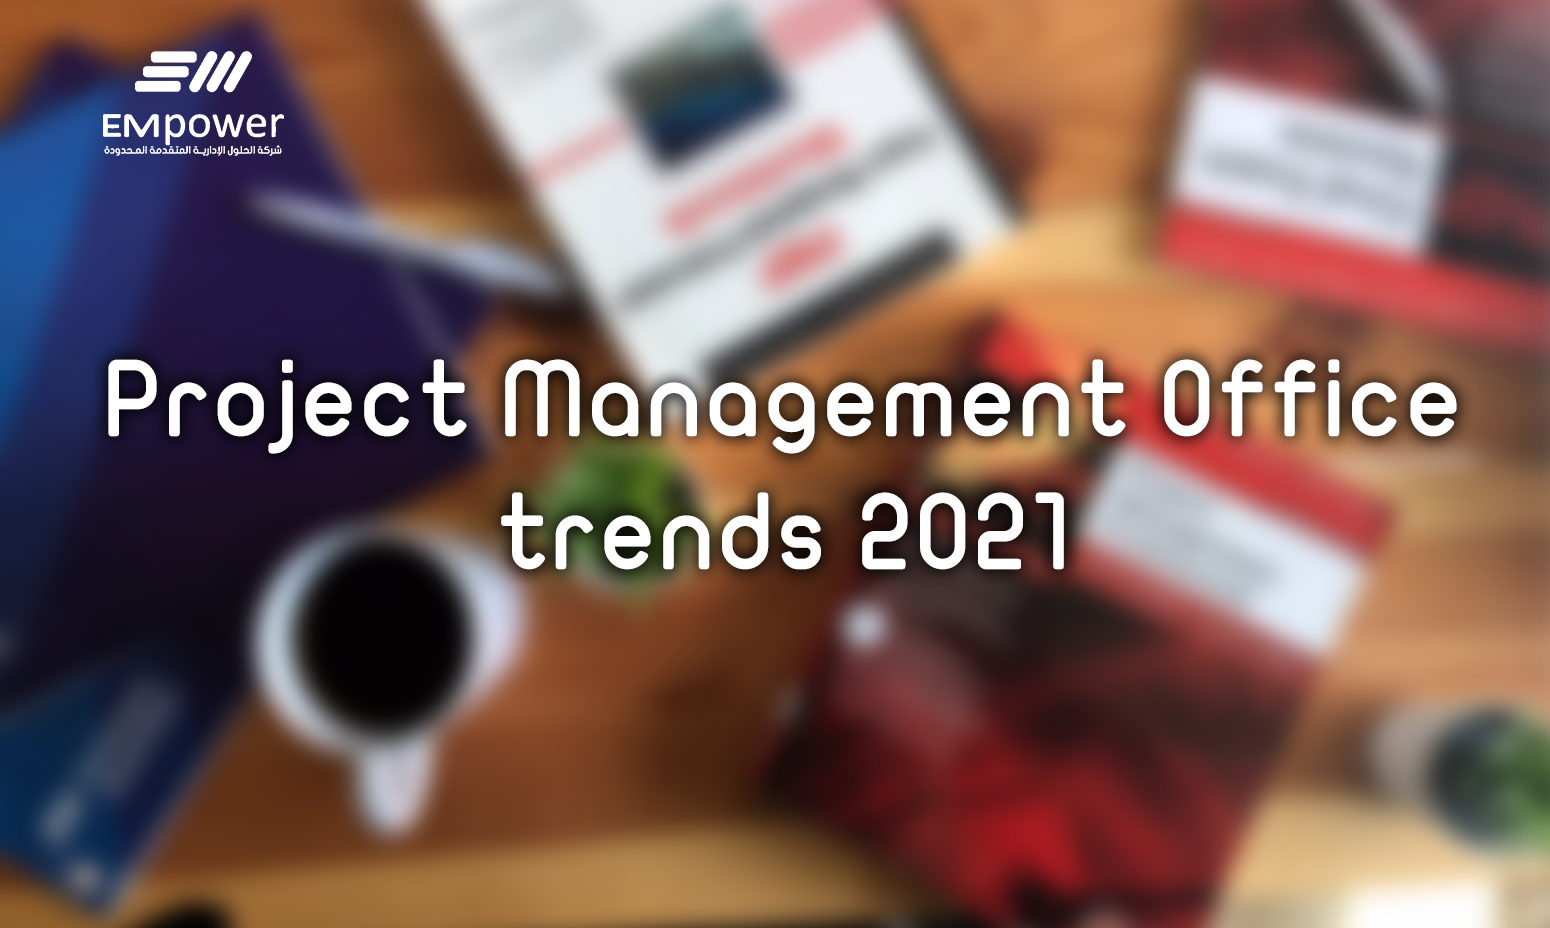 Project Management Office trends 2021 - تأسيس مكاتب إدارة المشاريع PMO